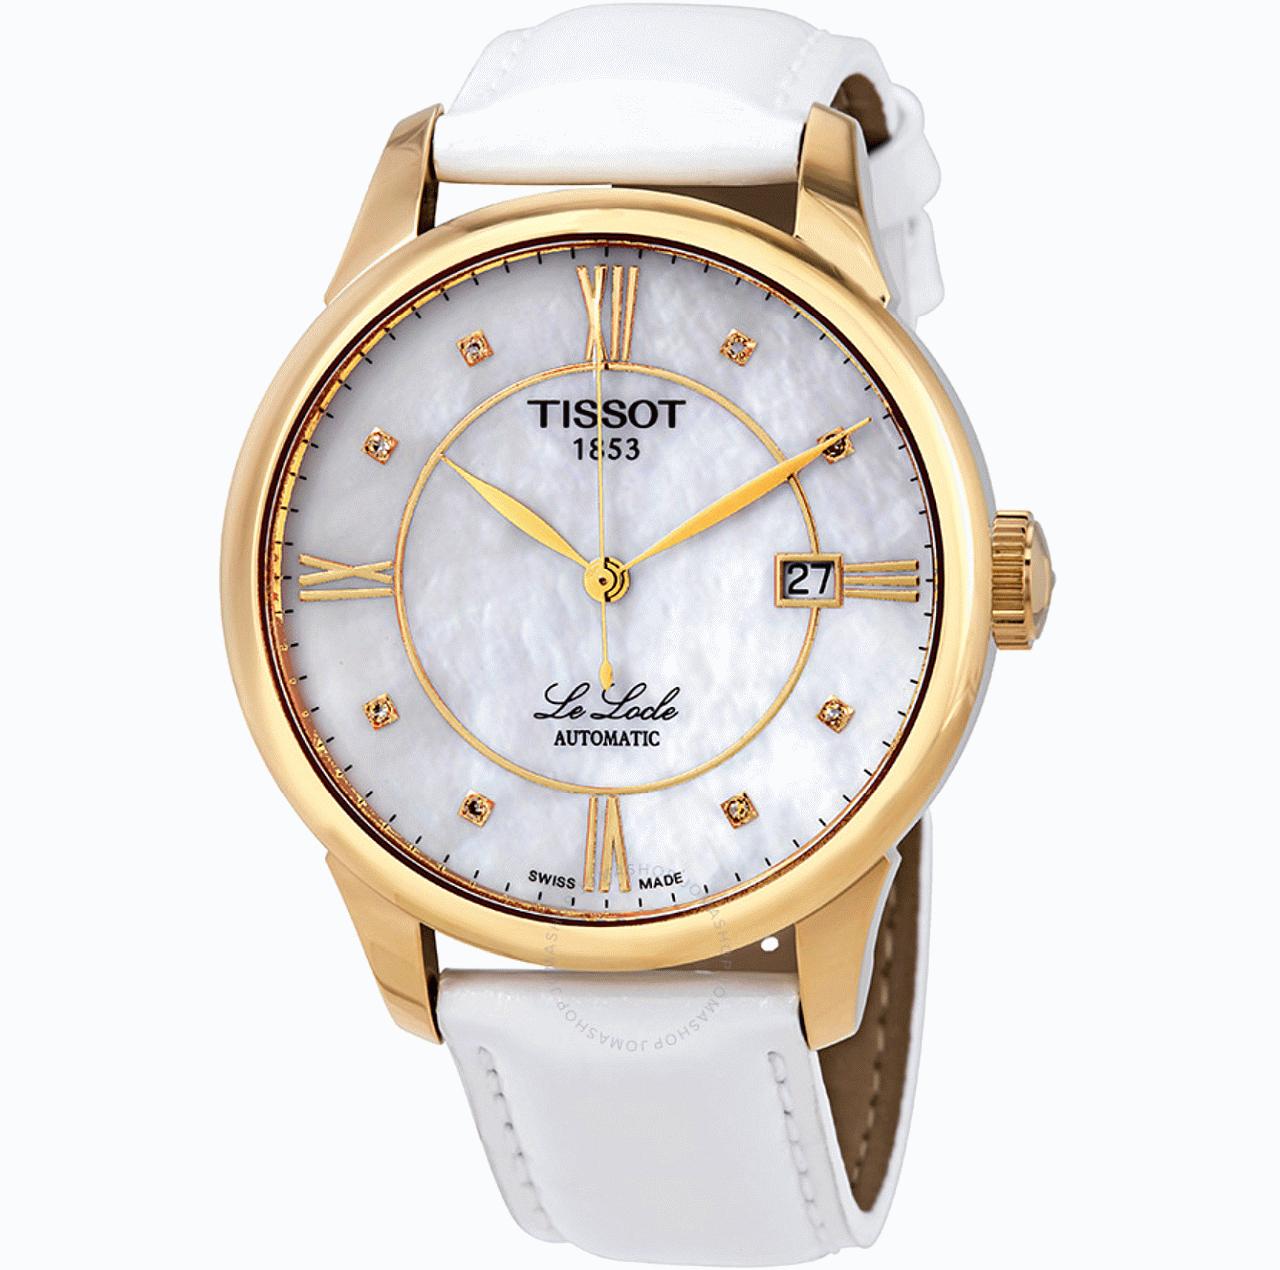 Tissot Le Locle Automatik Damen Uhr weiß/gold (ETA 2824-2, Saphirglas, Perlmutt)